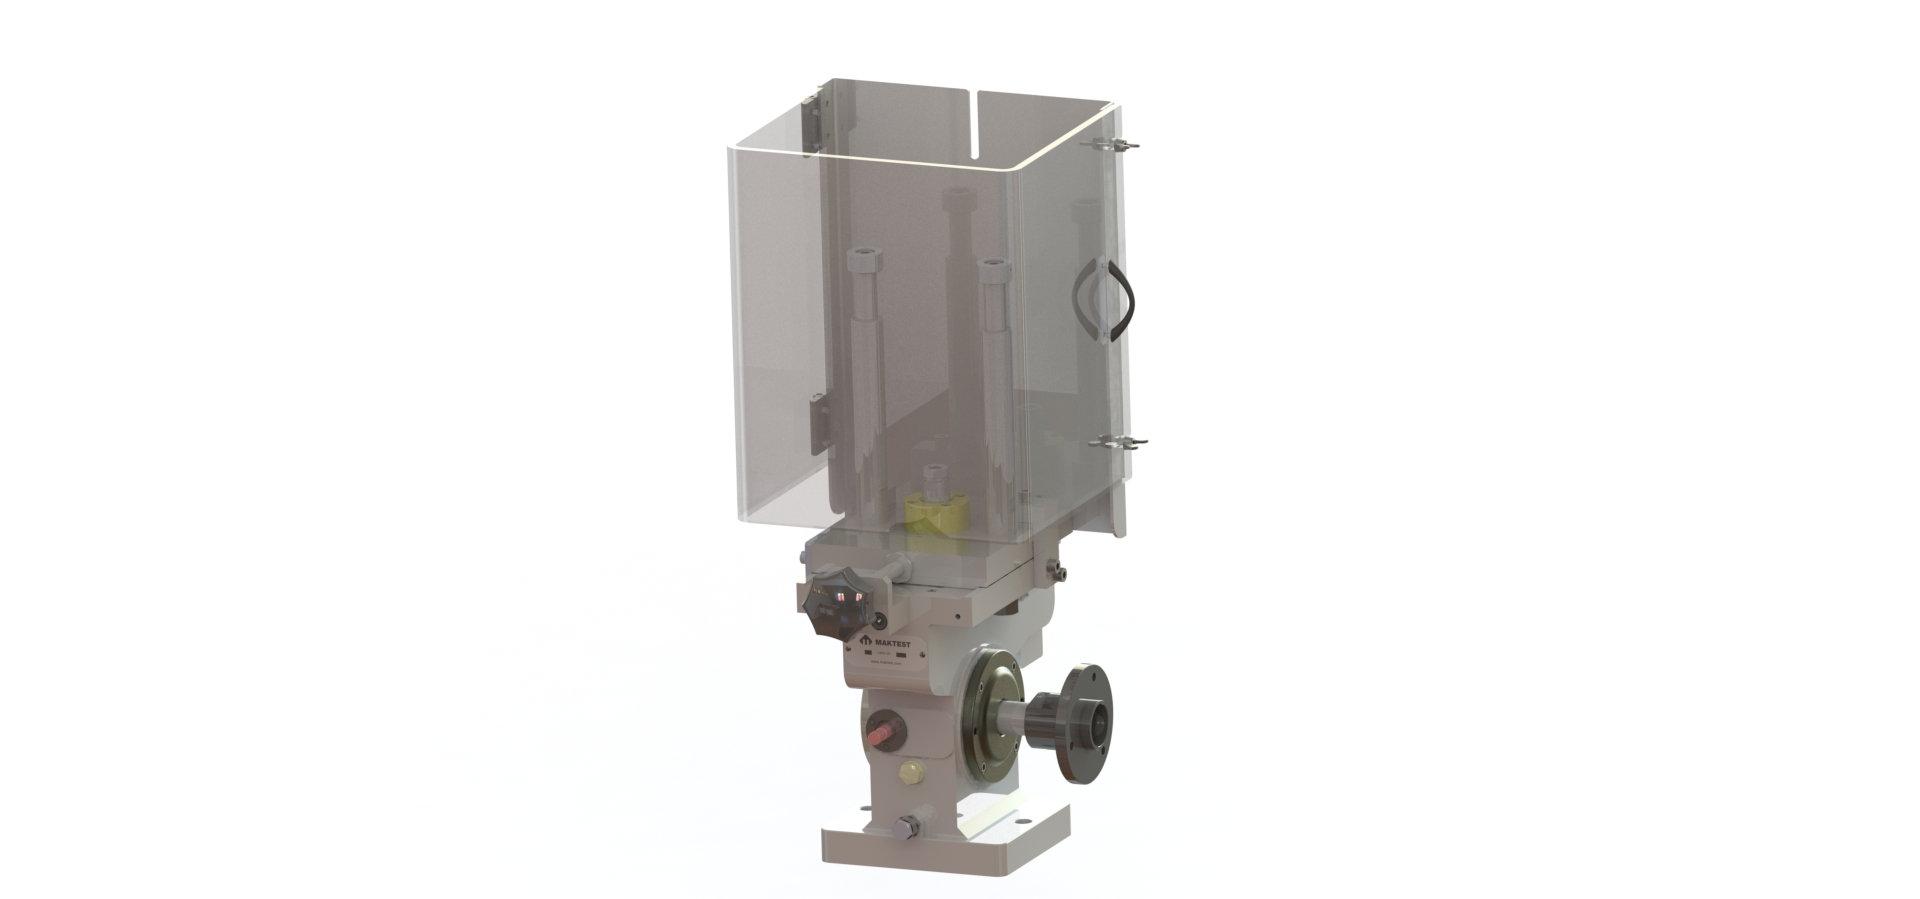 U1000 Cam Box for Testing Electronic Unit Injector and Unit Pump | Maktest  Inc